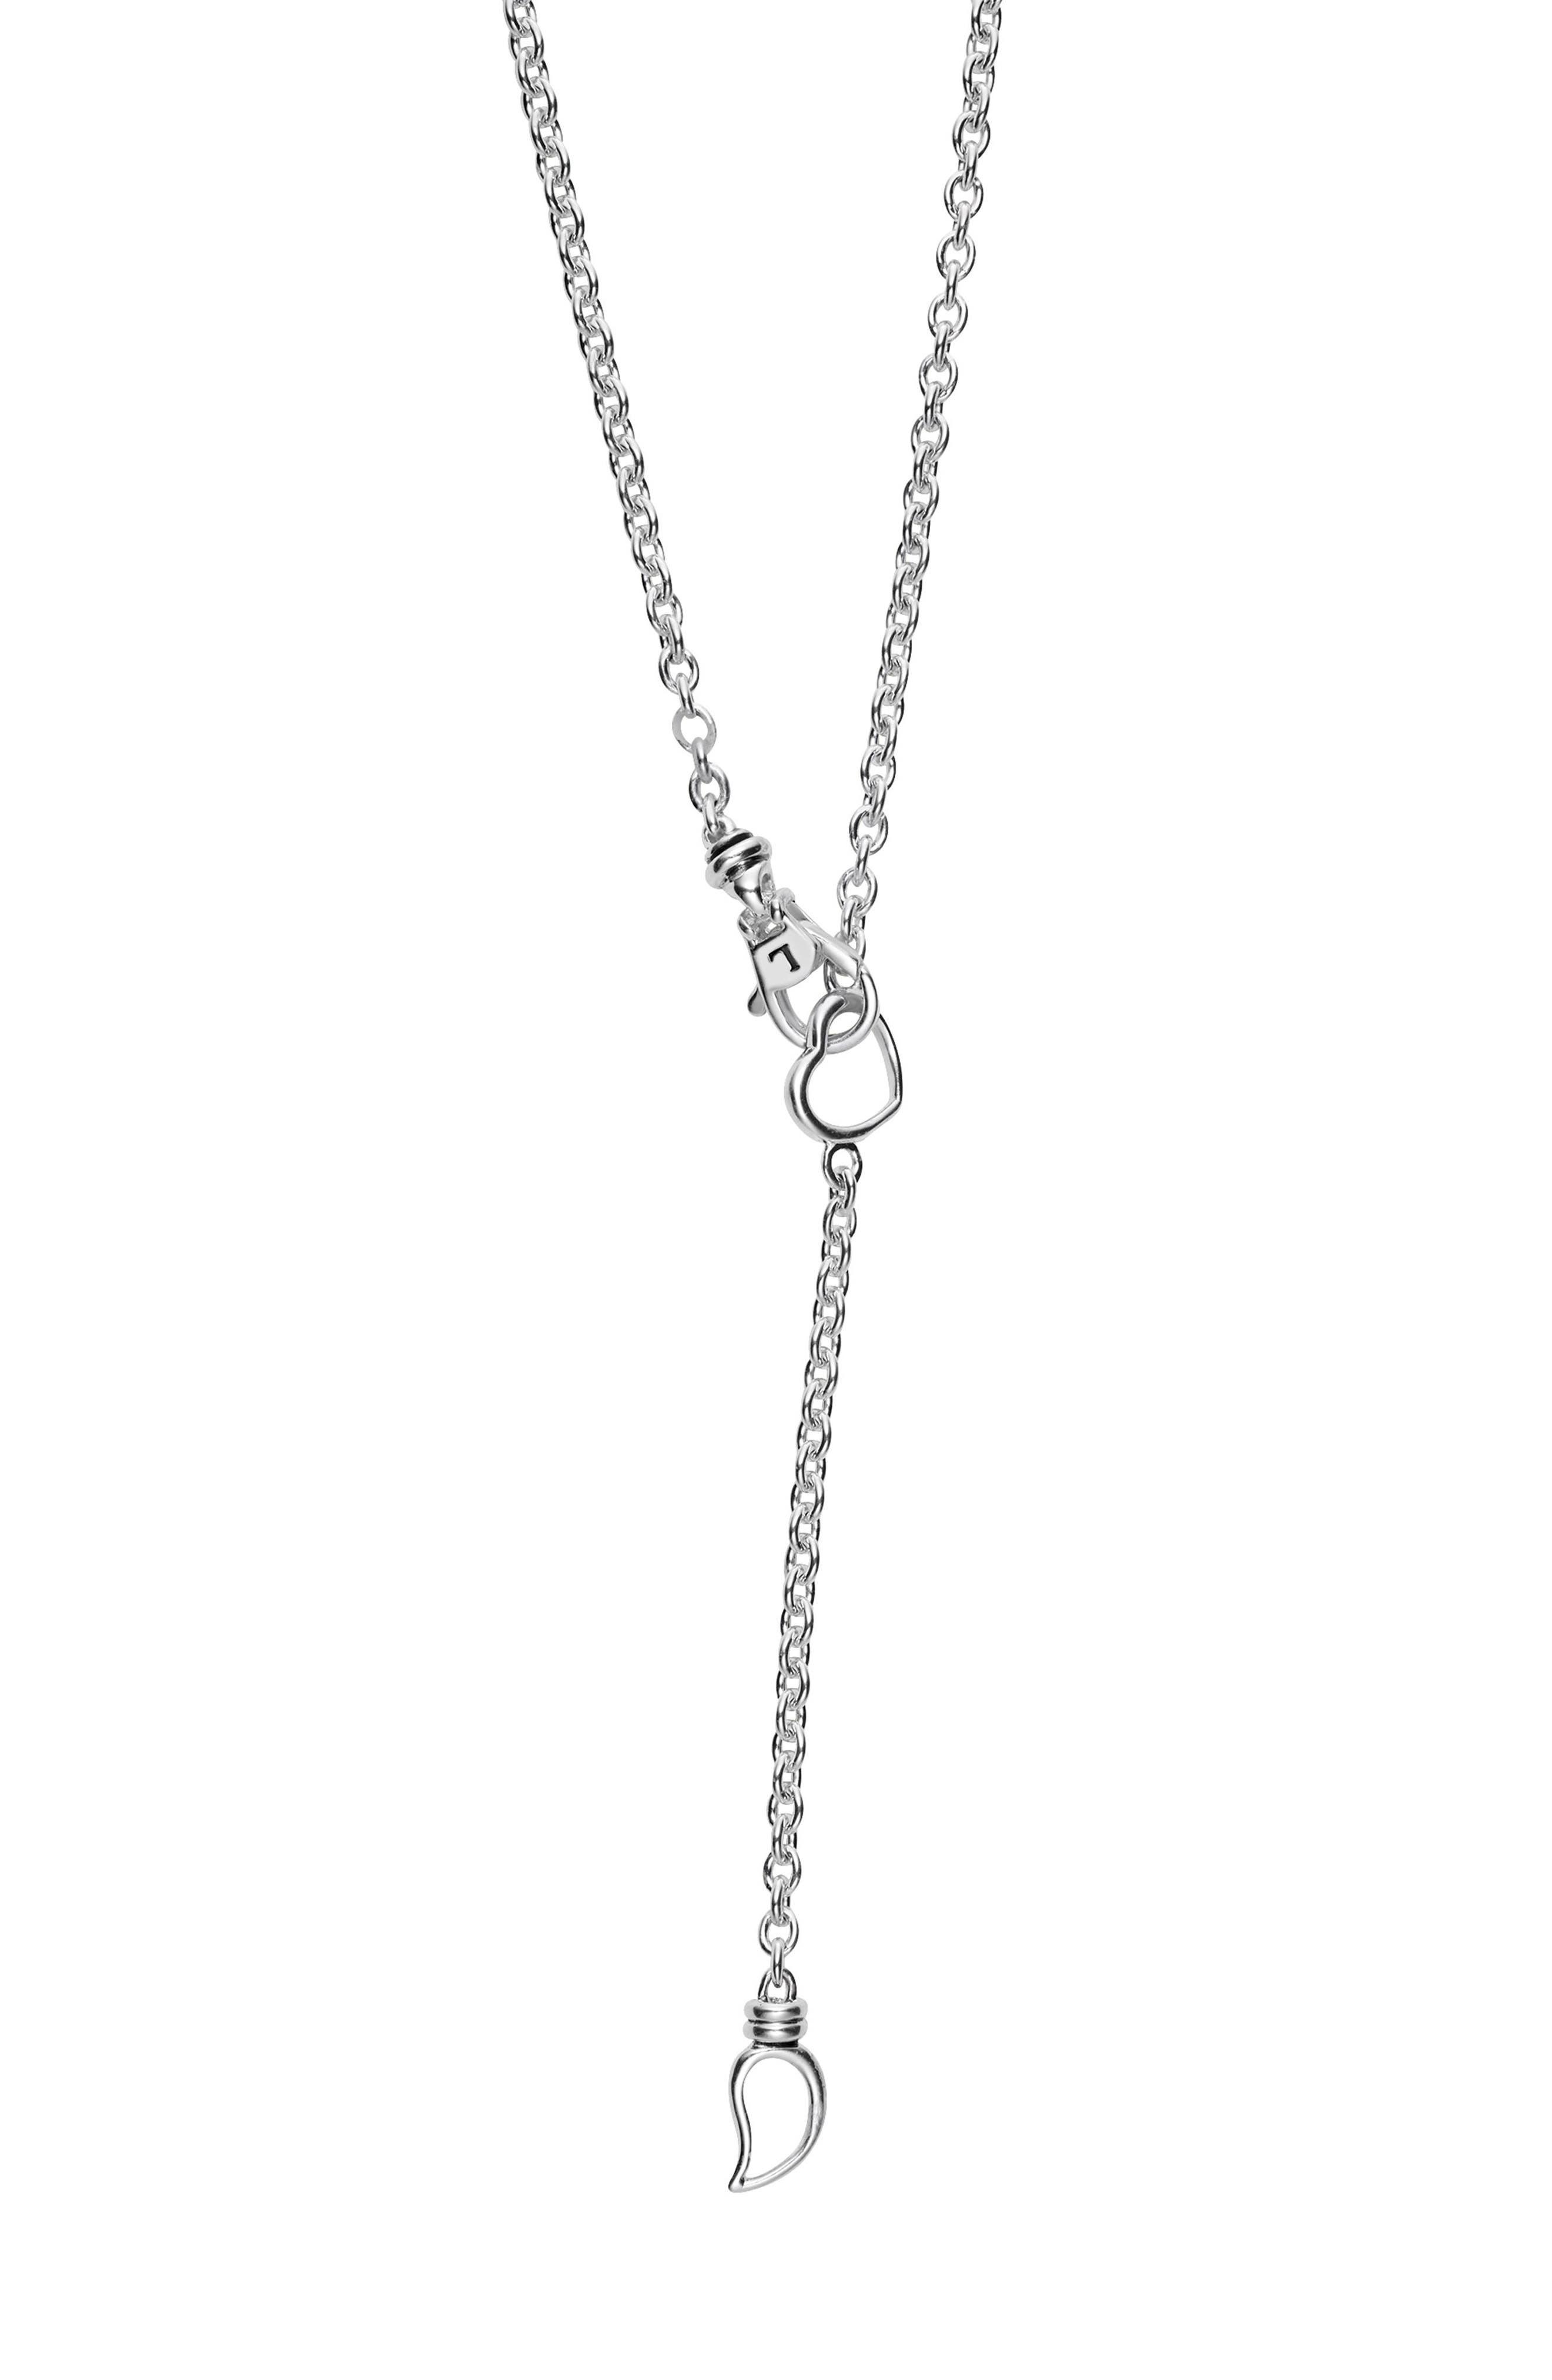 Beloved Diamond XOXO Chain Necklace,                             Alternate thumbnail 2, color,                             Silver/ Diamond